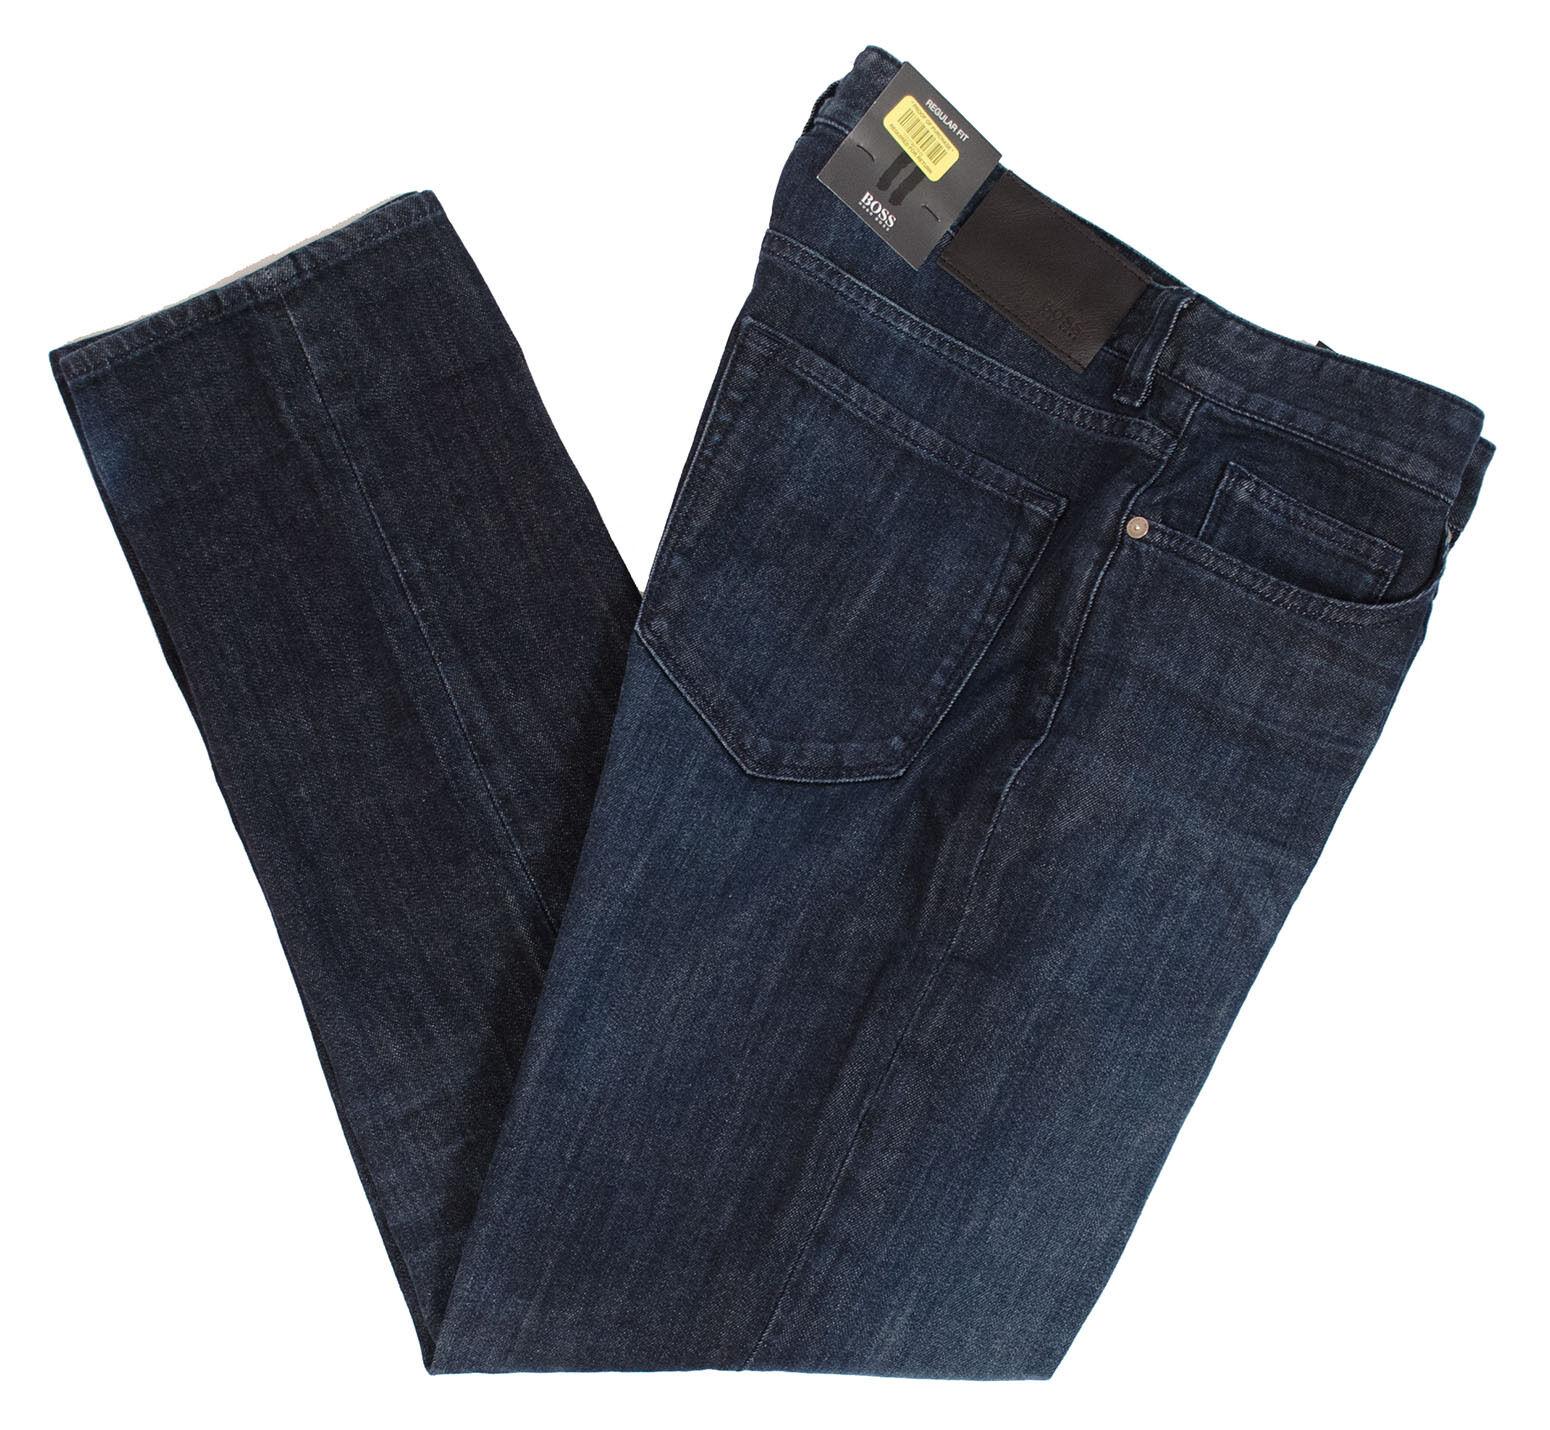 HUGO BOSS MAINE 3 50305967 MEN'S REGULAR FIT STRETCH blueE JEANS PANTS MULTISIZE